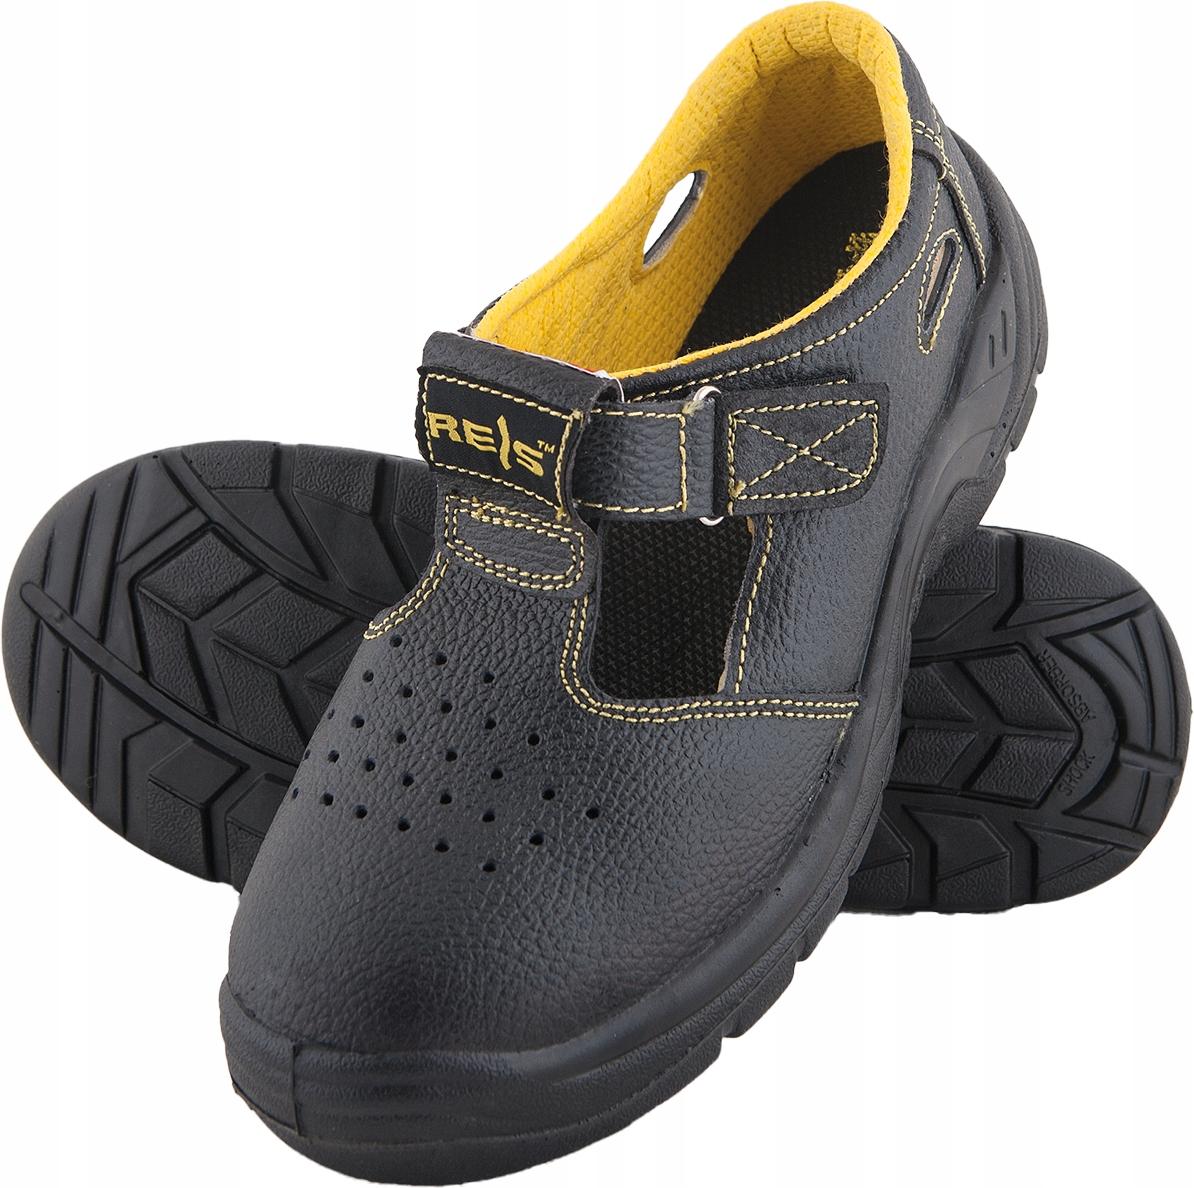 Обувь летние Сандалии рабочие REIS SB E YES р. 47